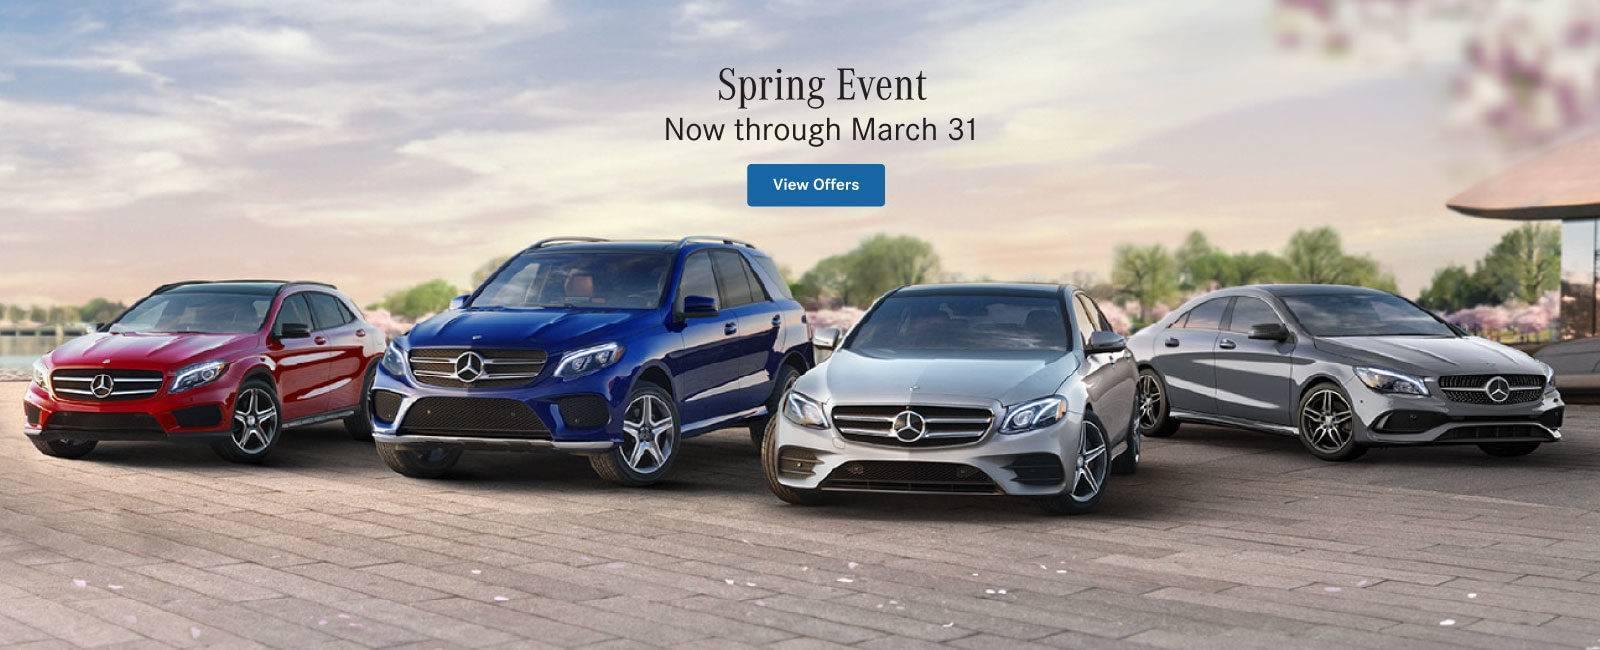 MB-Manhattan-Spring-Event